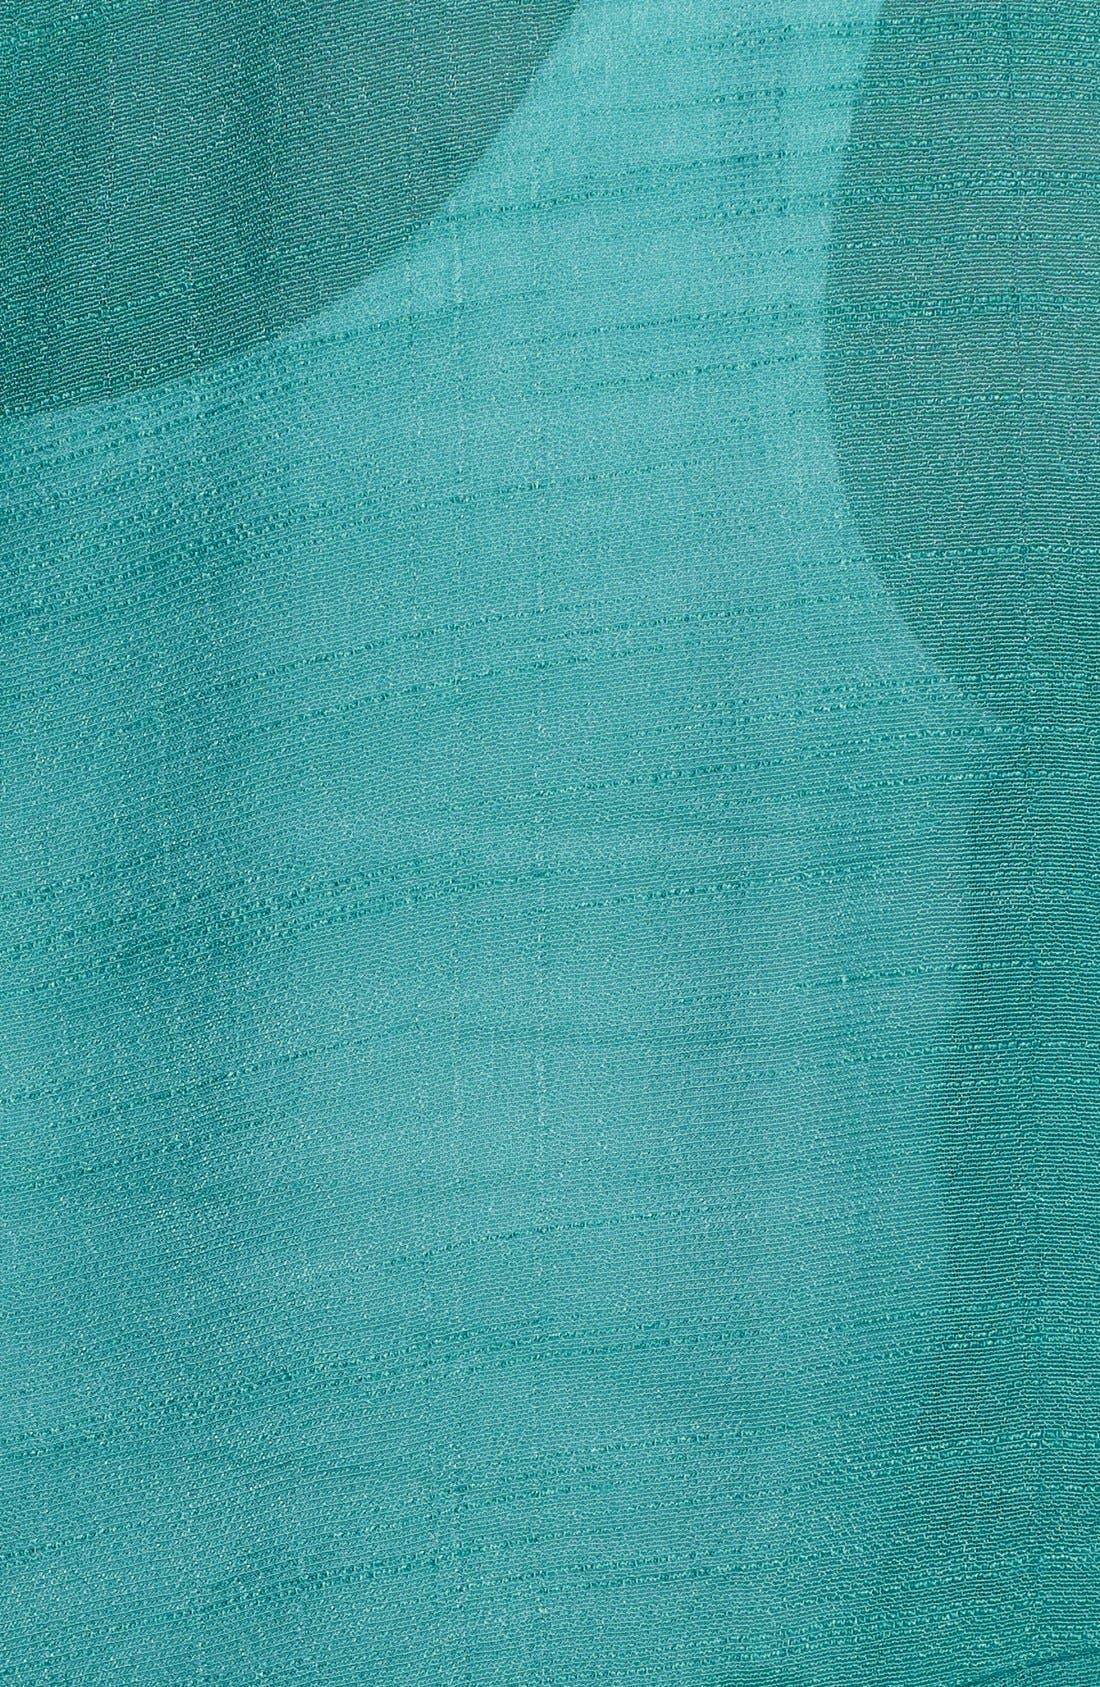 Alternate Image 3  - Bobeau High/Low Textured Blouse (Plus Size)